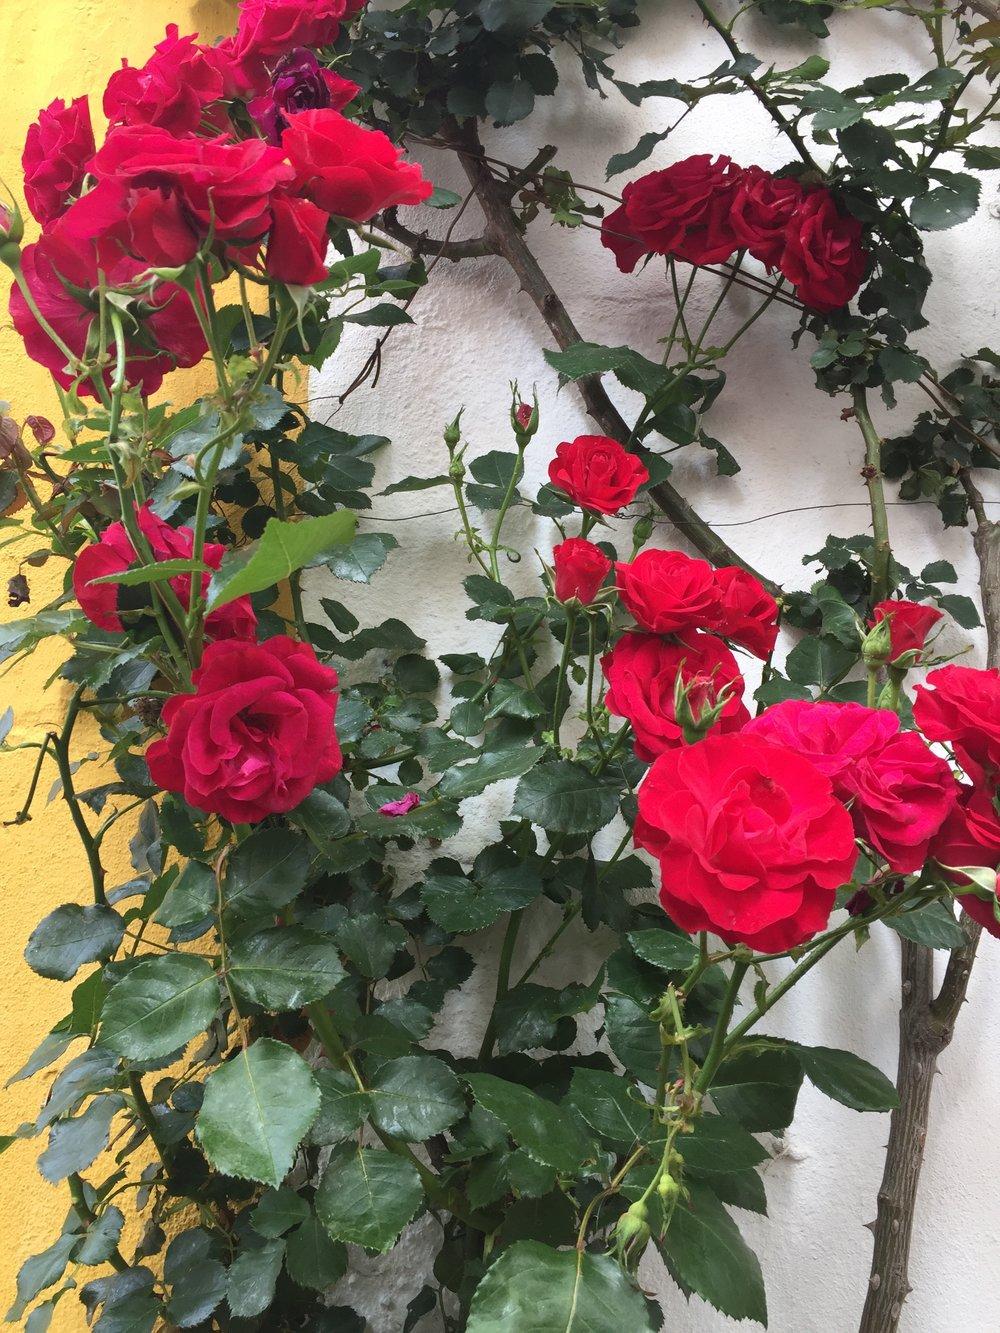 Flores por toda parte...